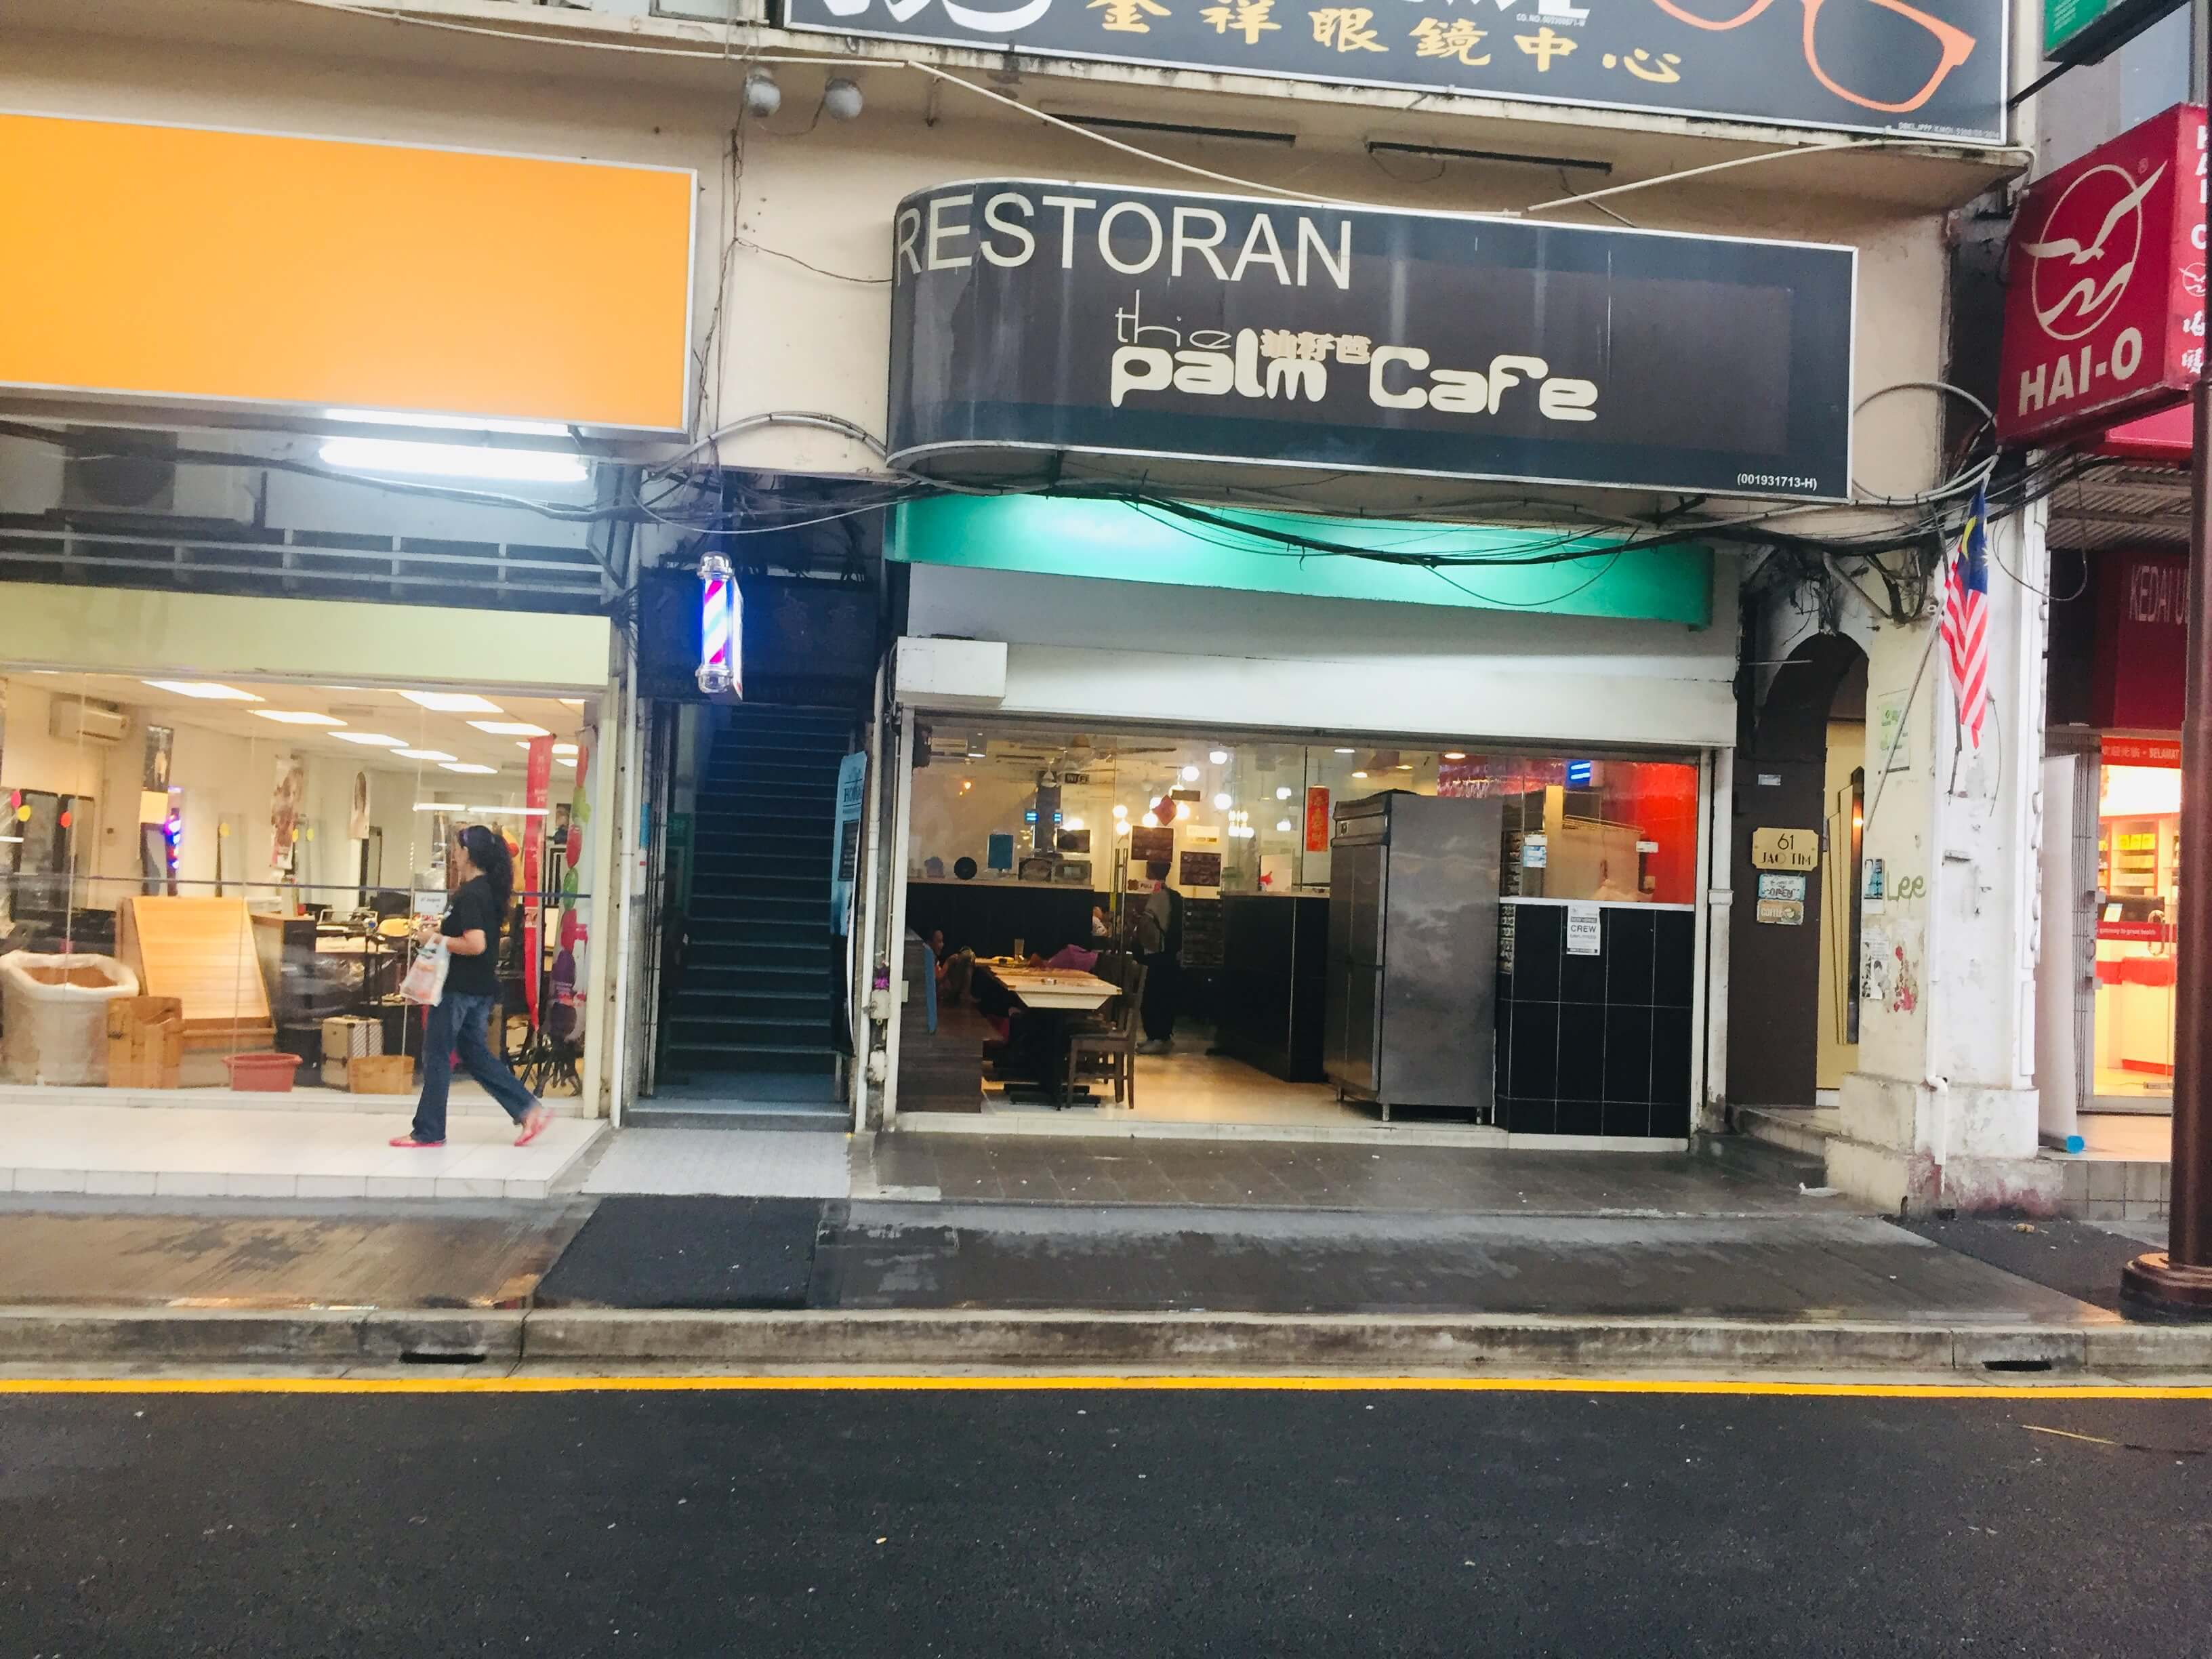 Iマレーシアの中華系に人気なレストラン